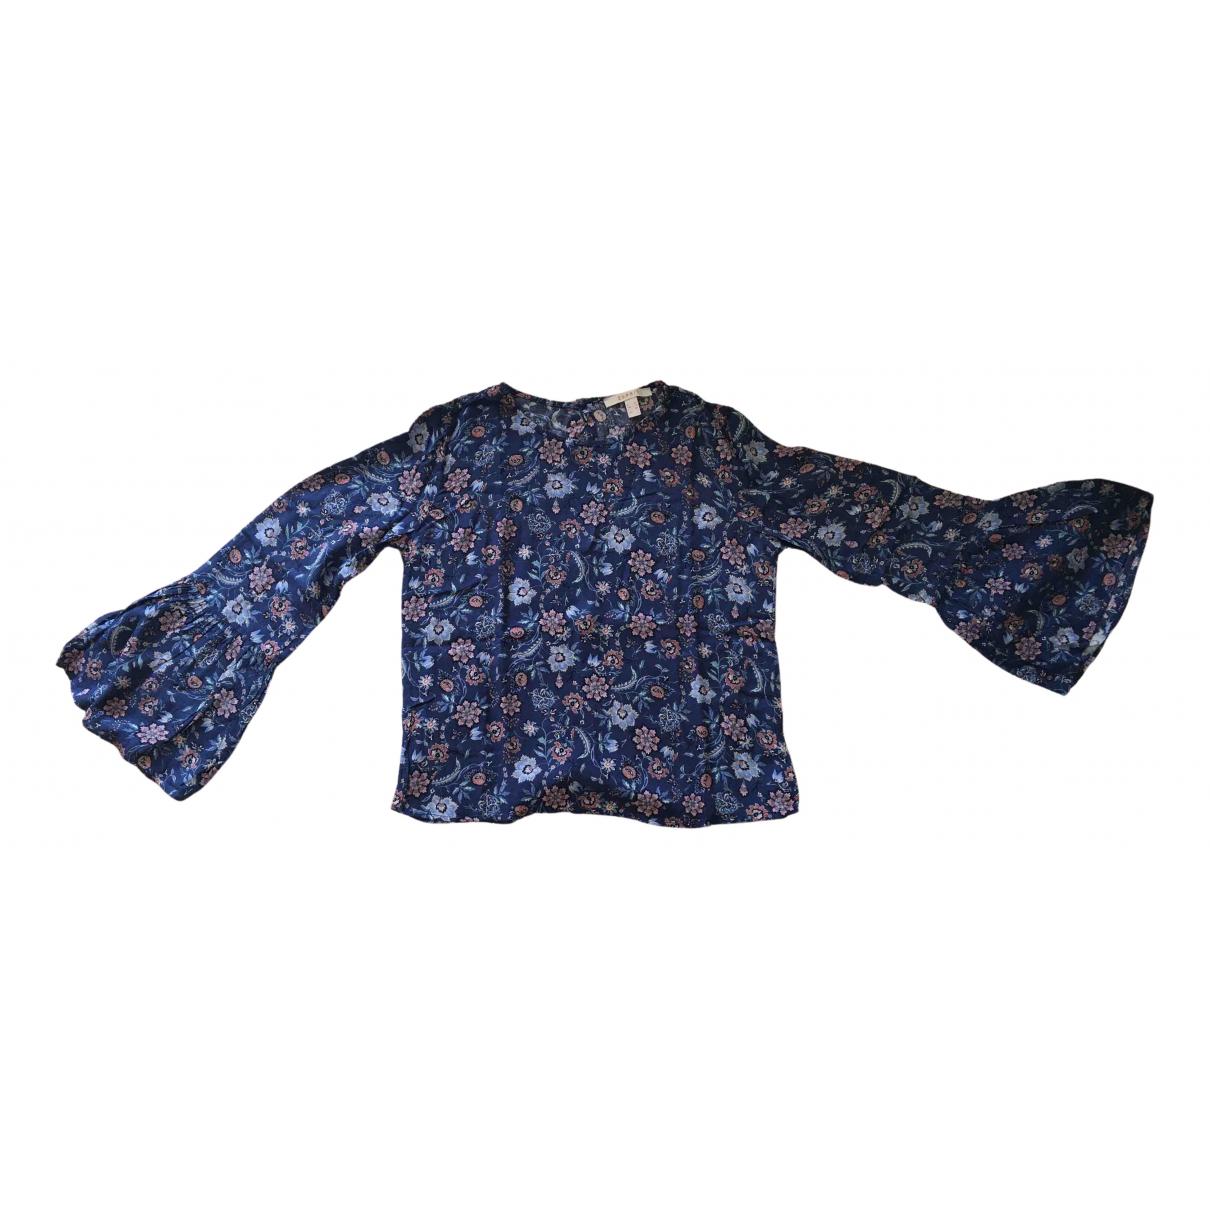 Esprit N Blue  top for Women 34 FR